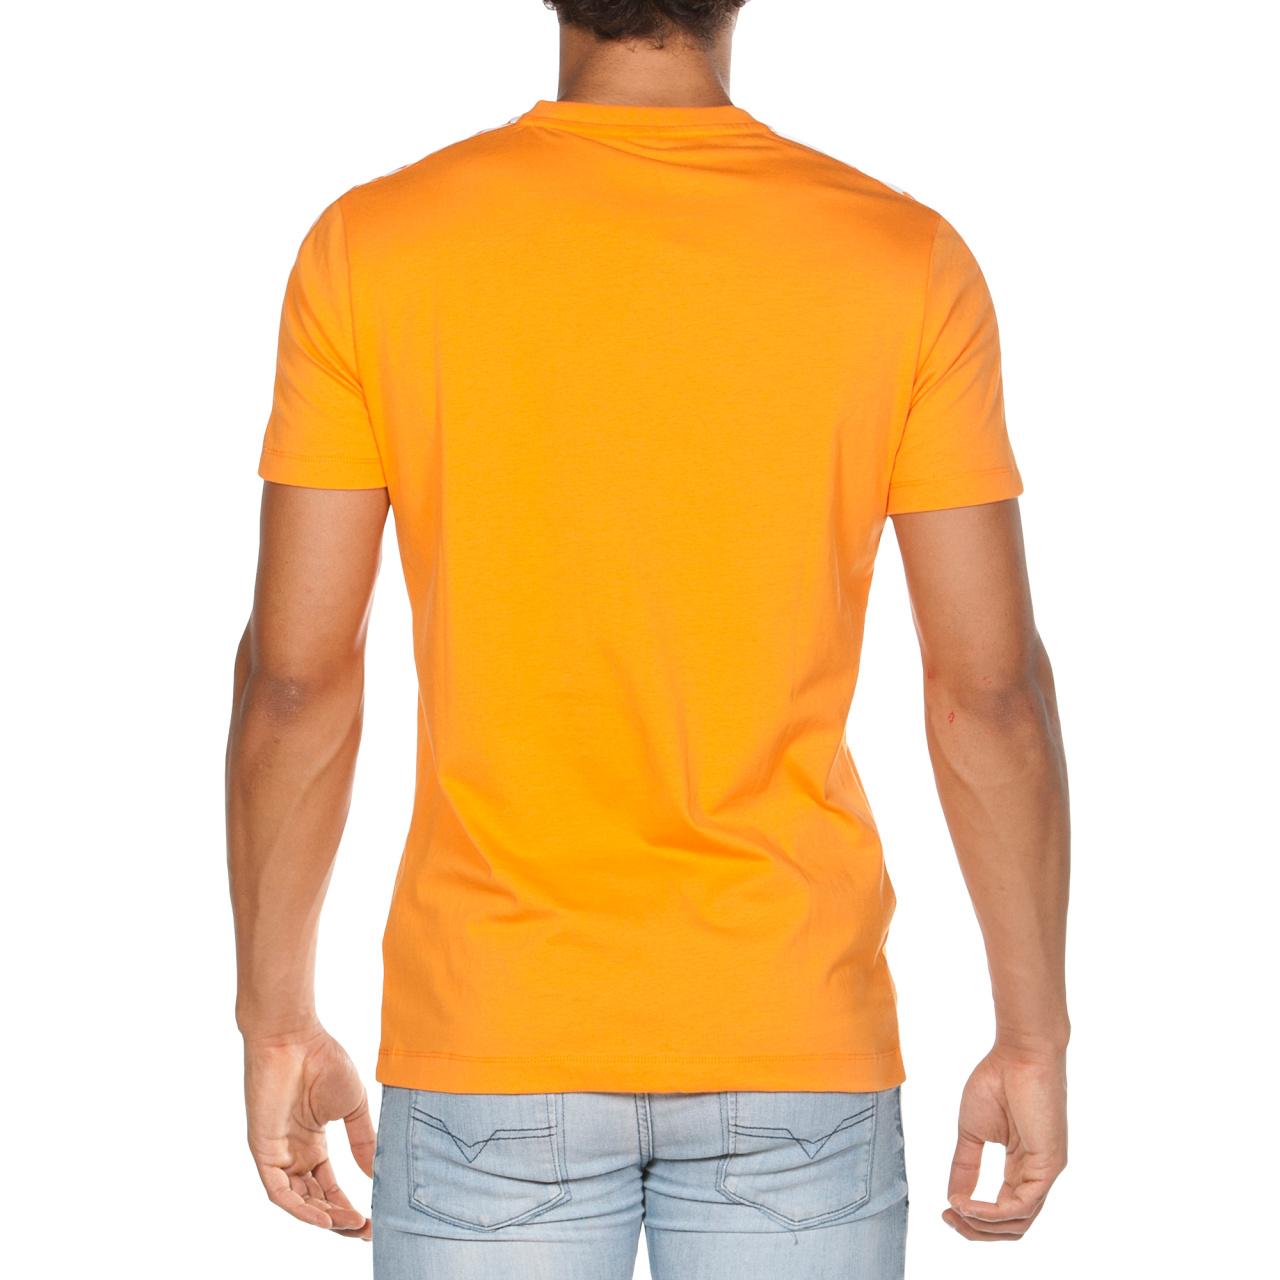 Camiseta Icons arena para Hombre Relax Team_6770